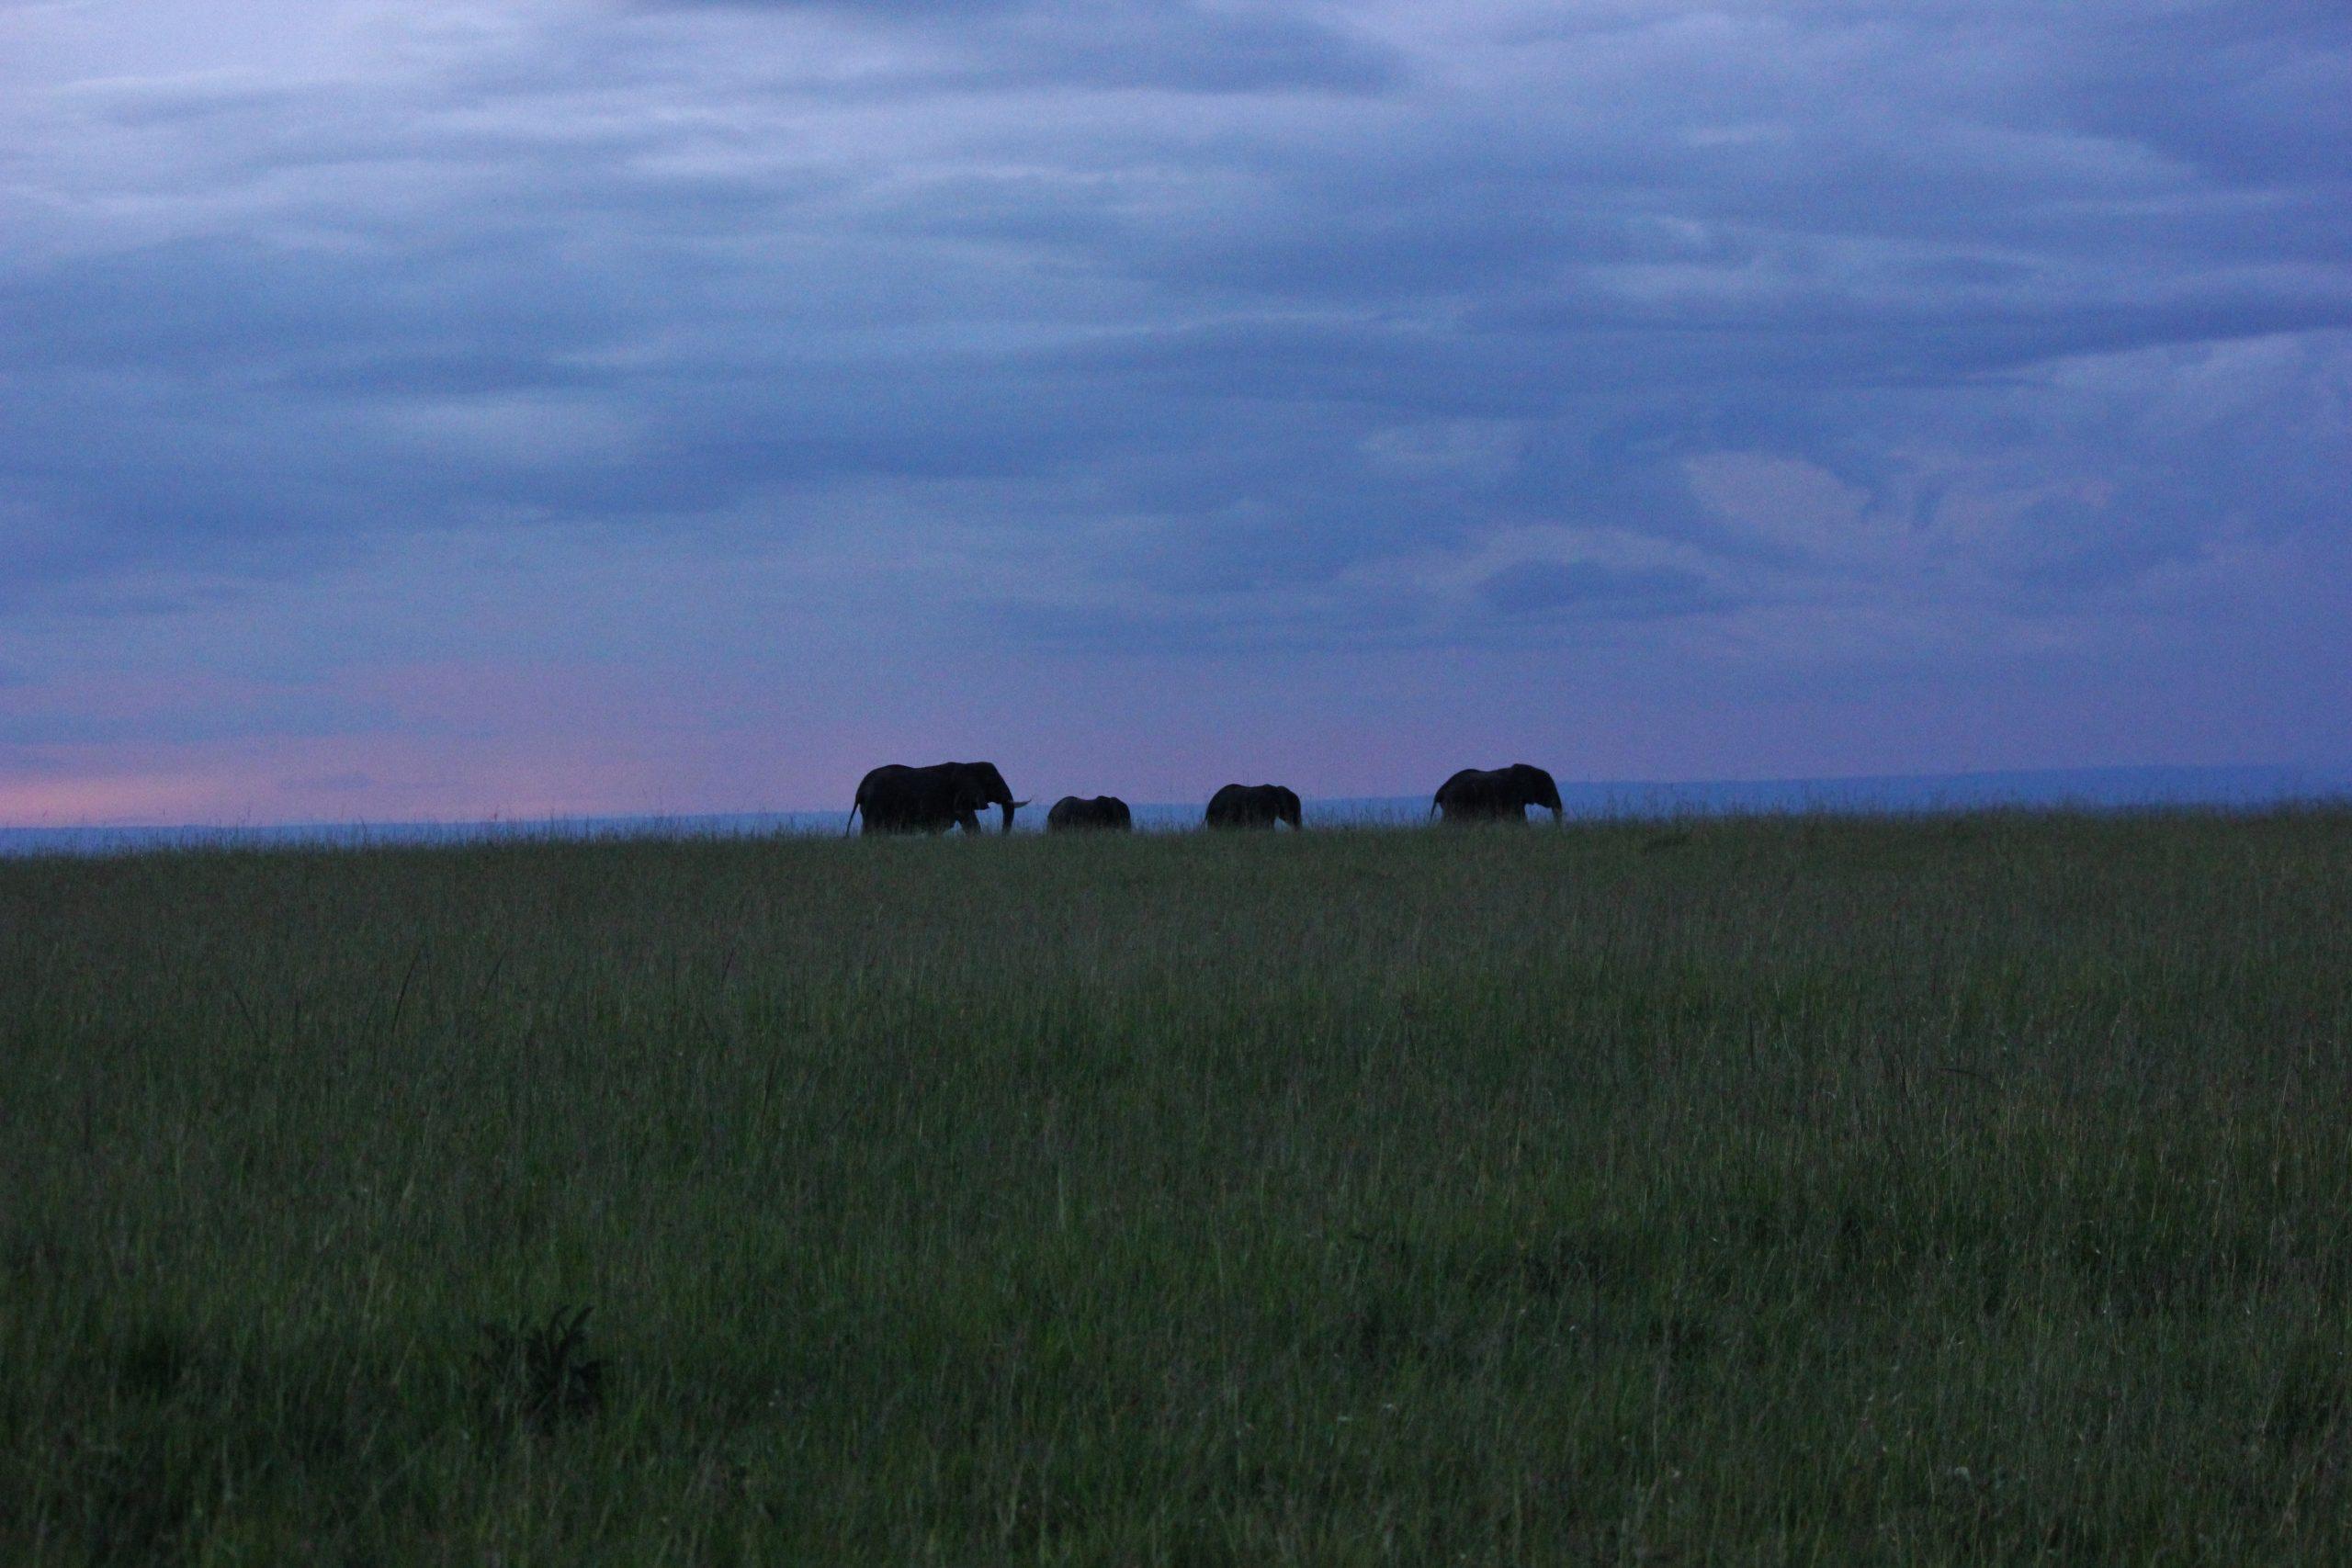 Elephants in Masai Mara nature reserve in Kenya